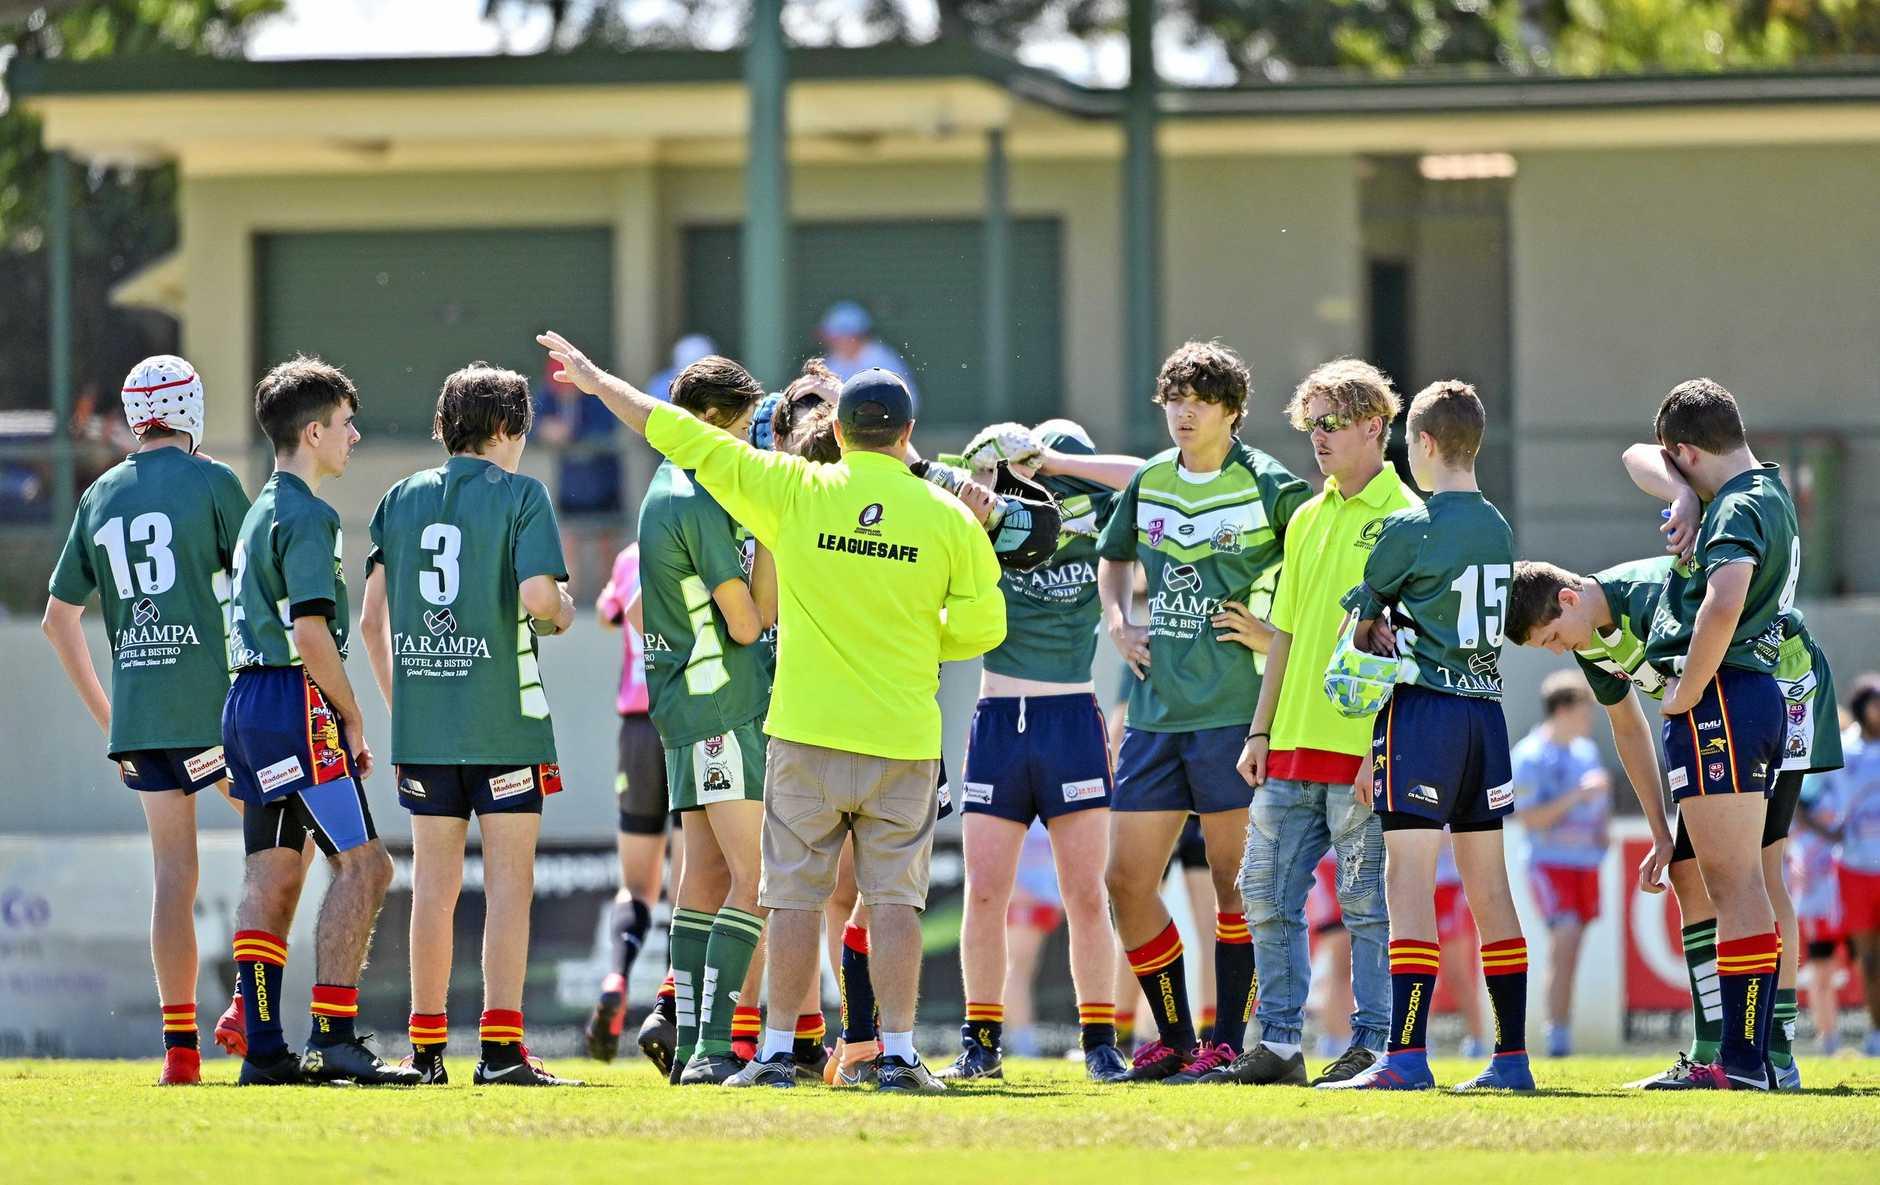 U15 Junior Development League Grand final between Swifts and Karalee/Lowood.